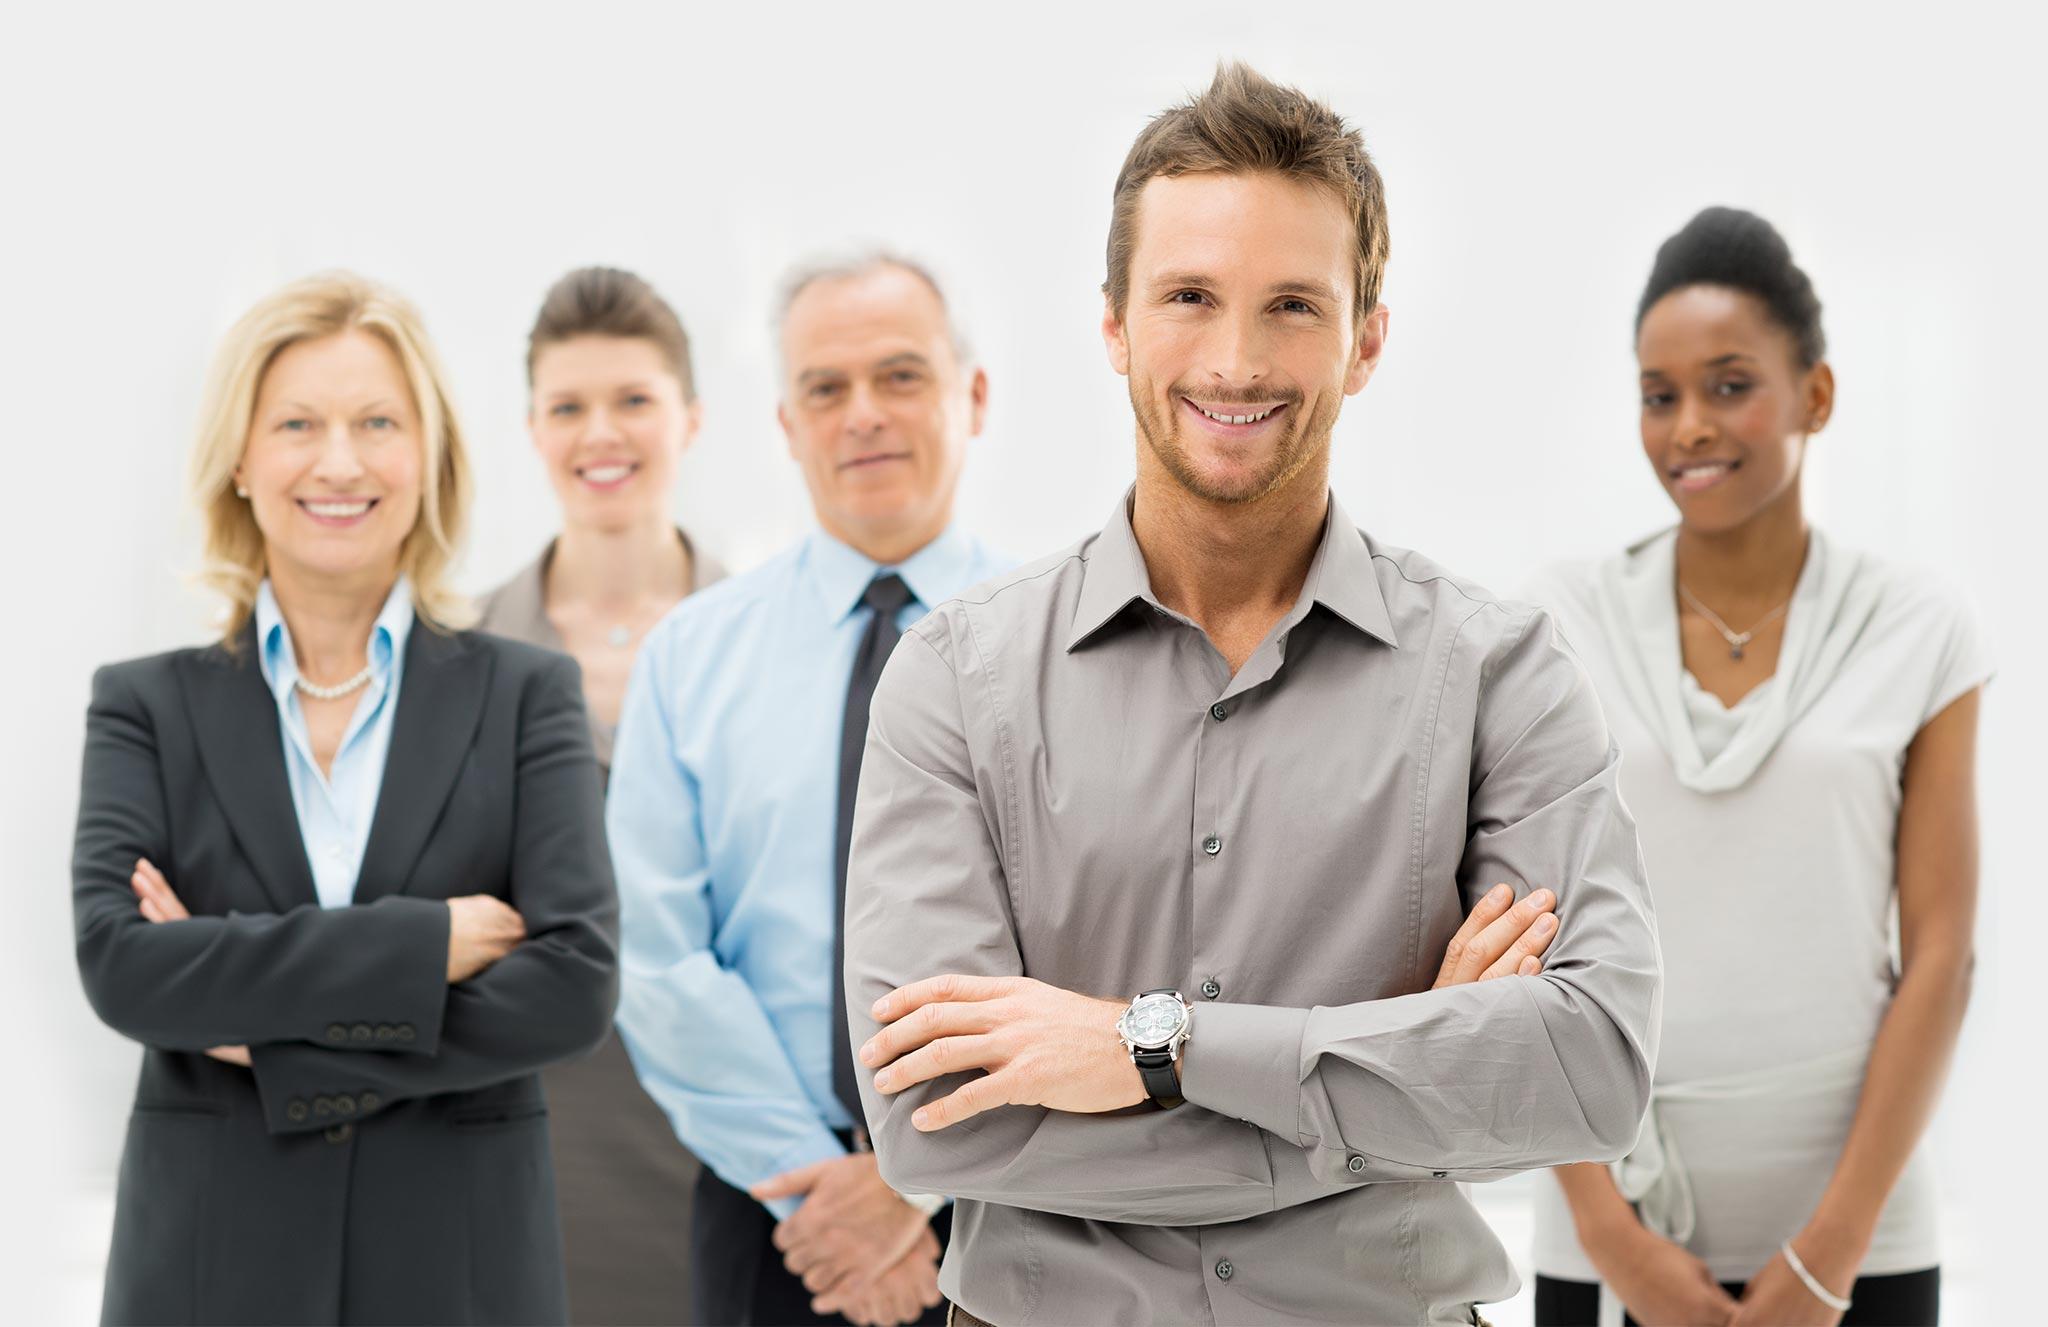 бизнесмен и его команда